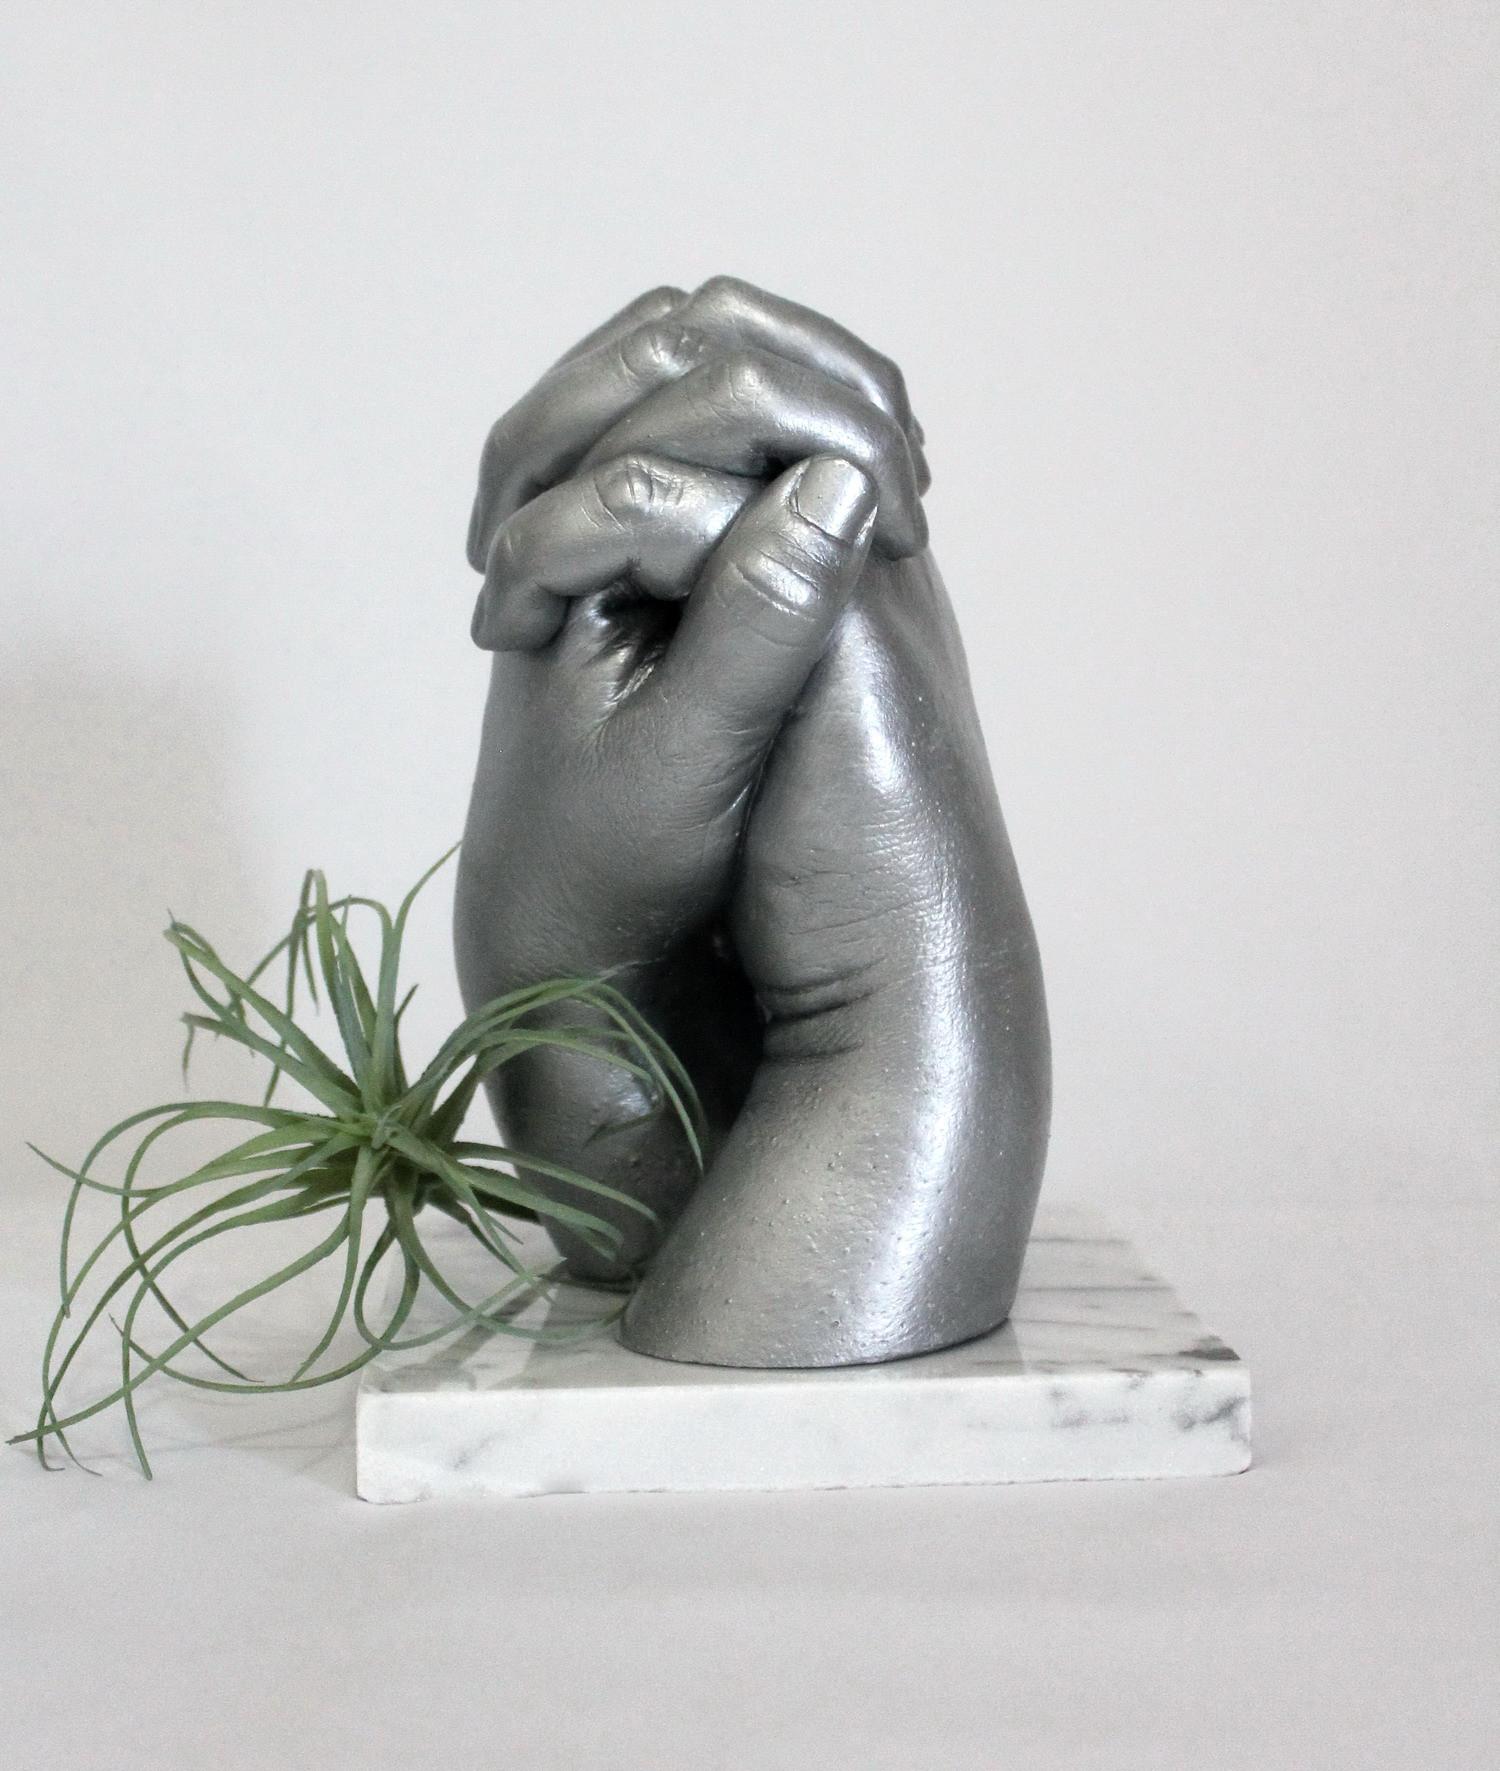 3D Couple's Hand Casting